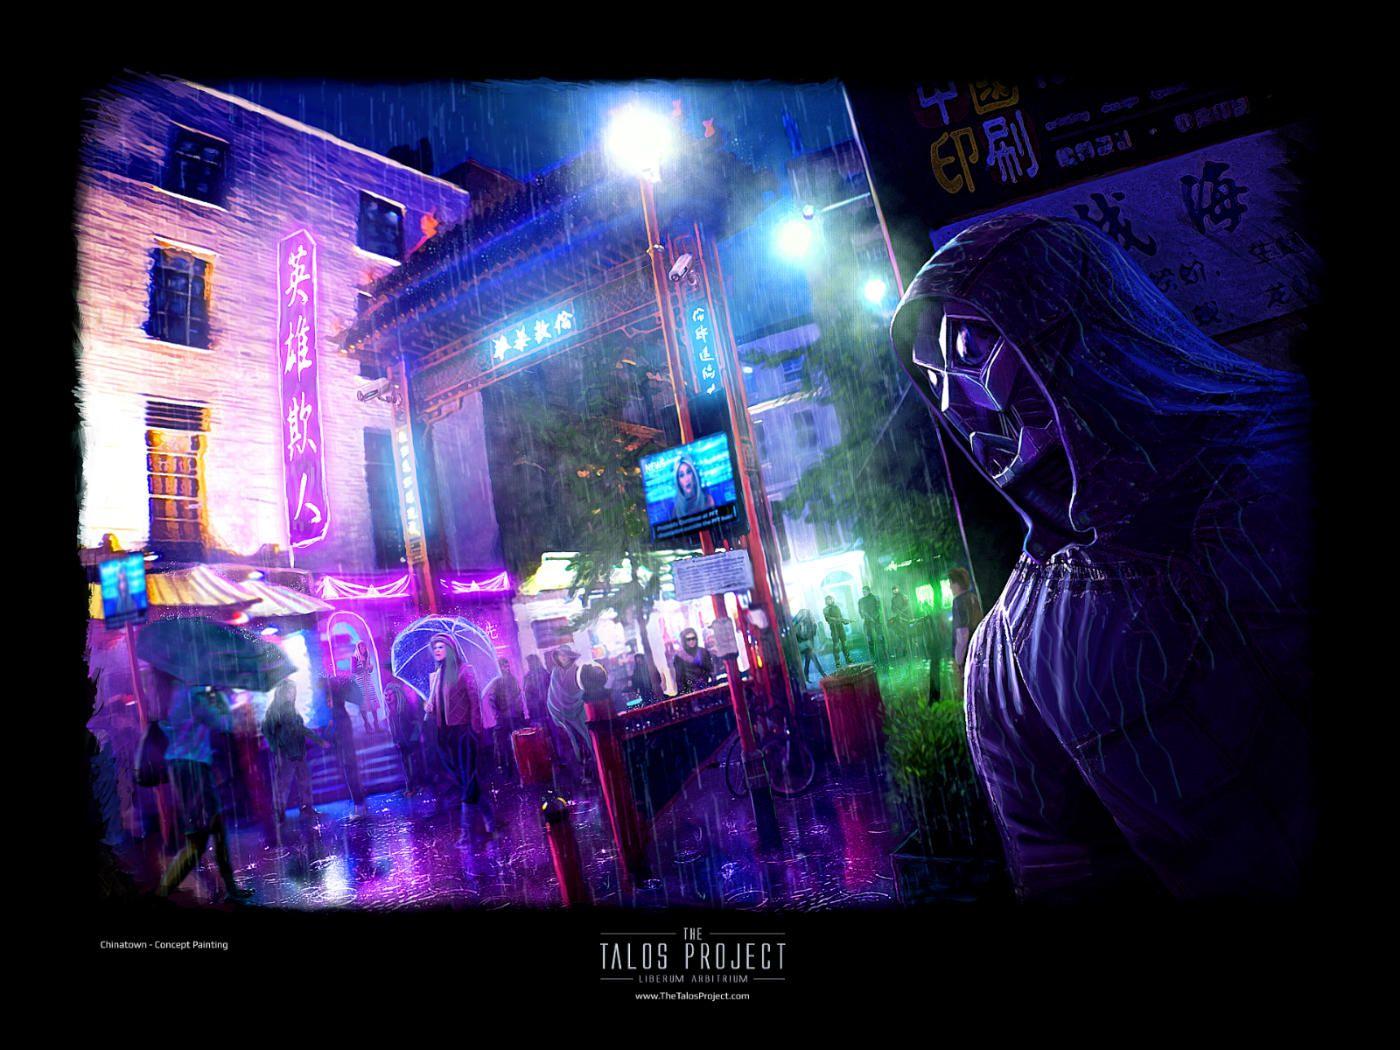 Chinatown Cyberpunk Concept Art